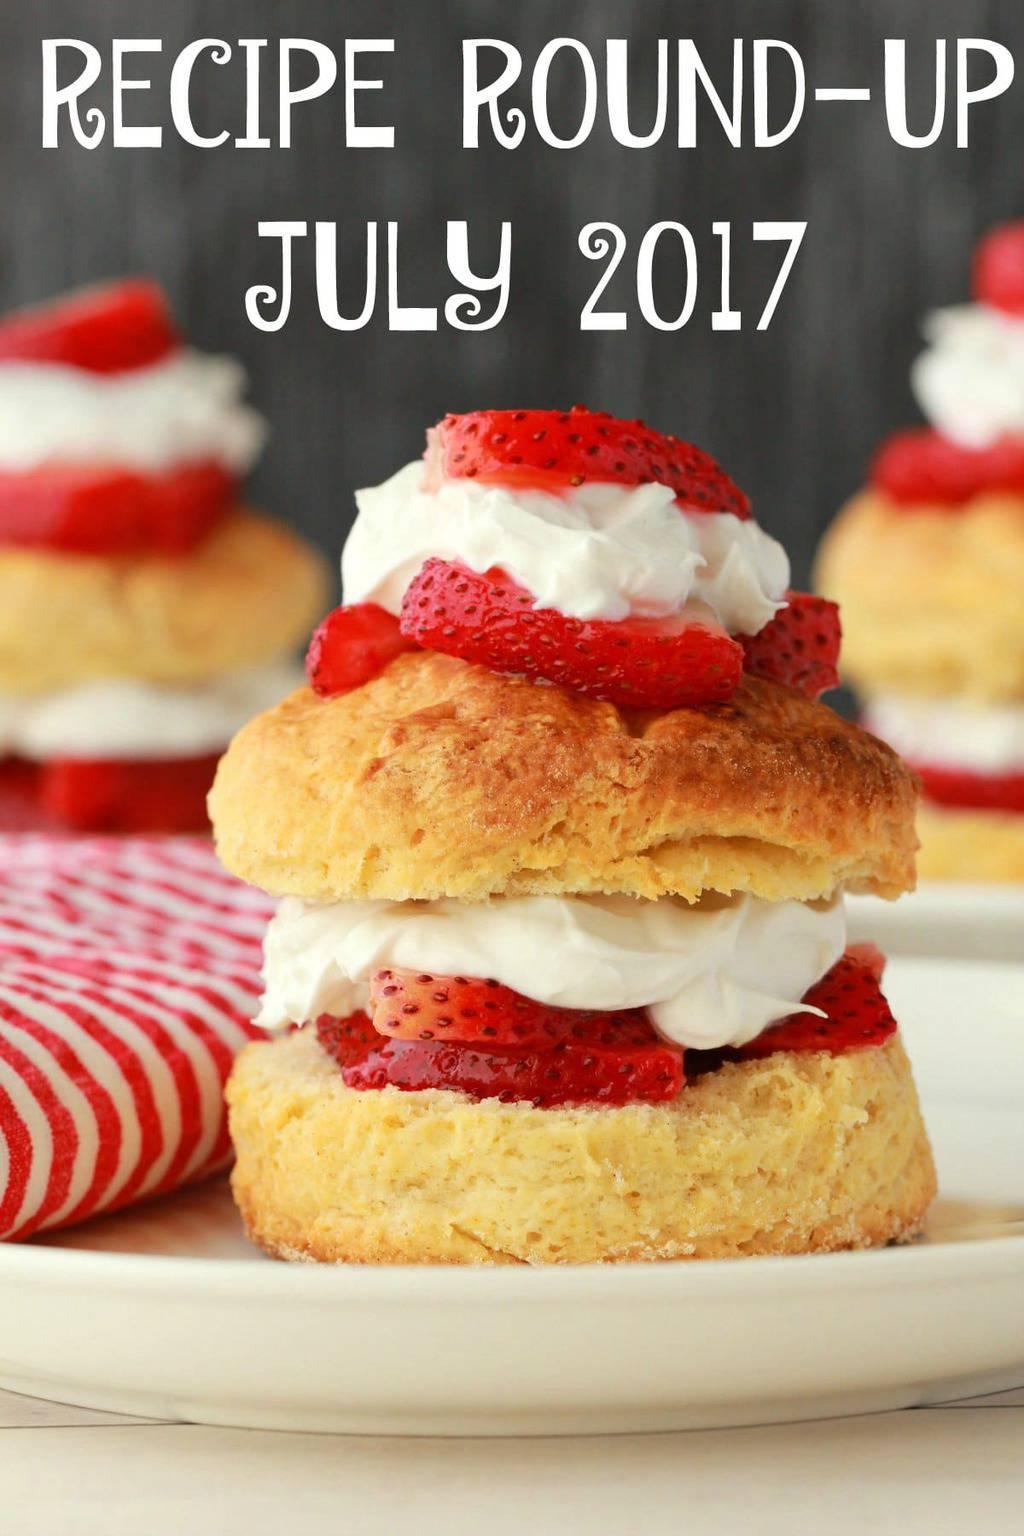 Recipe Round Up - July 2017